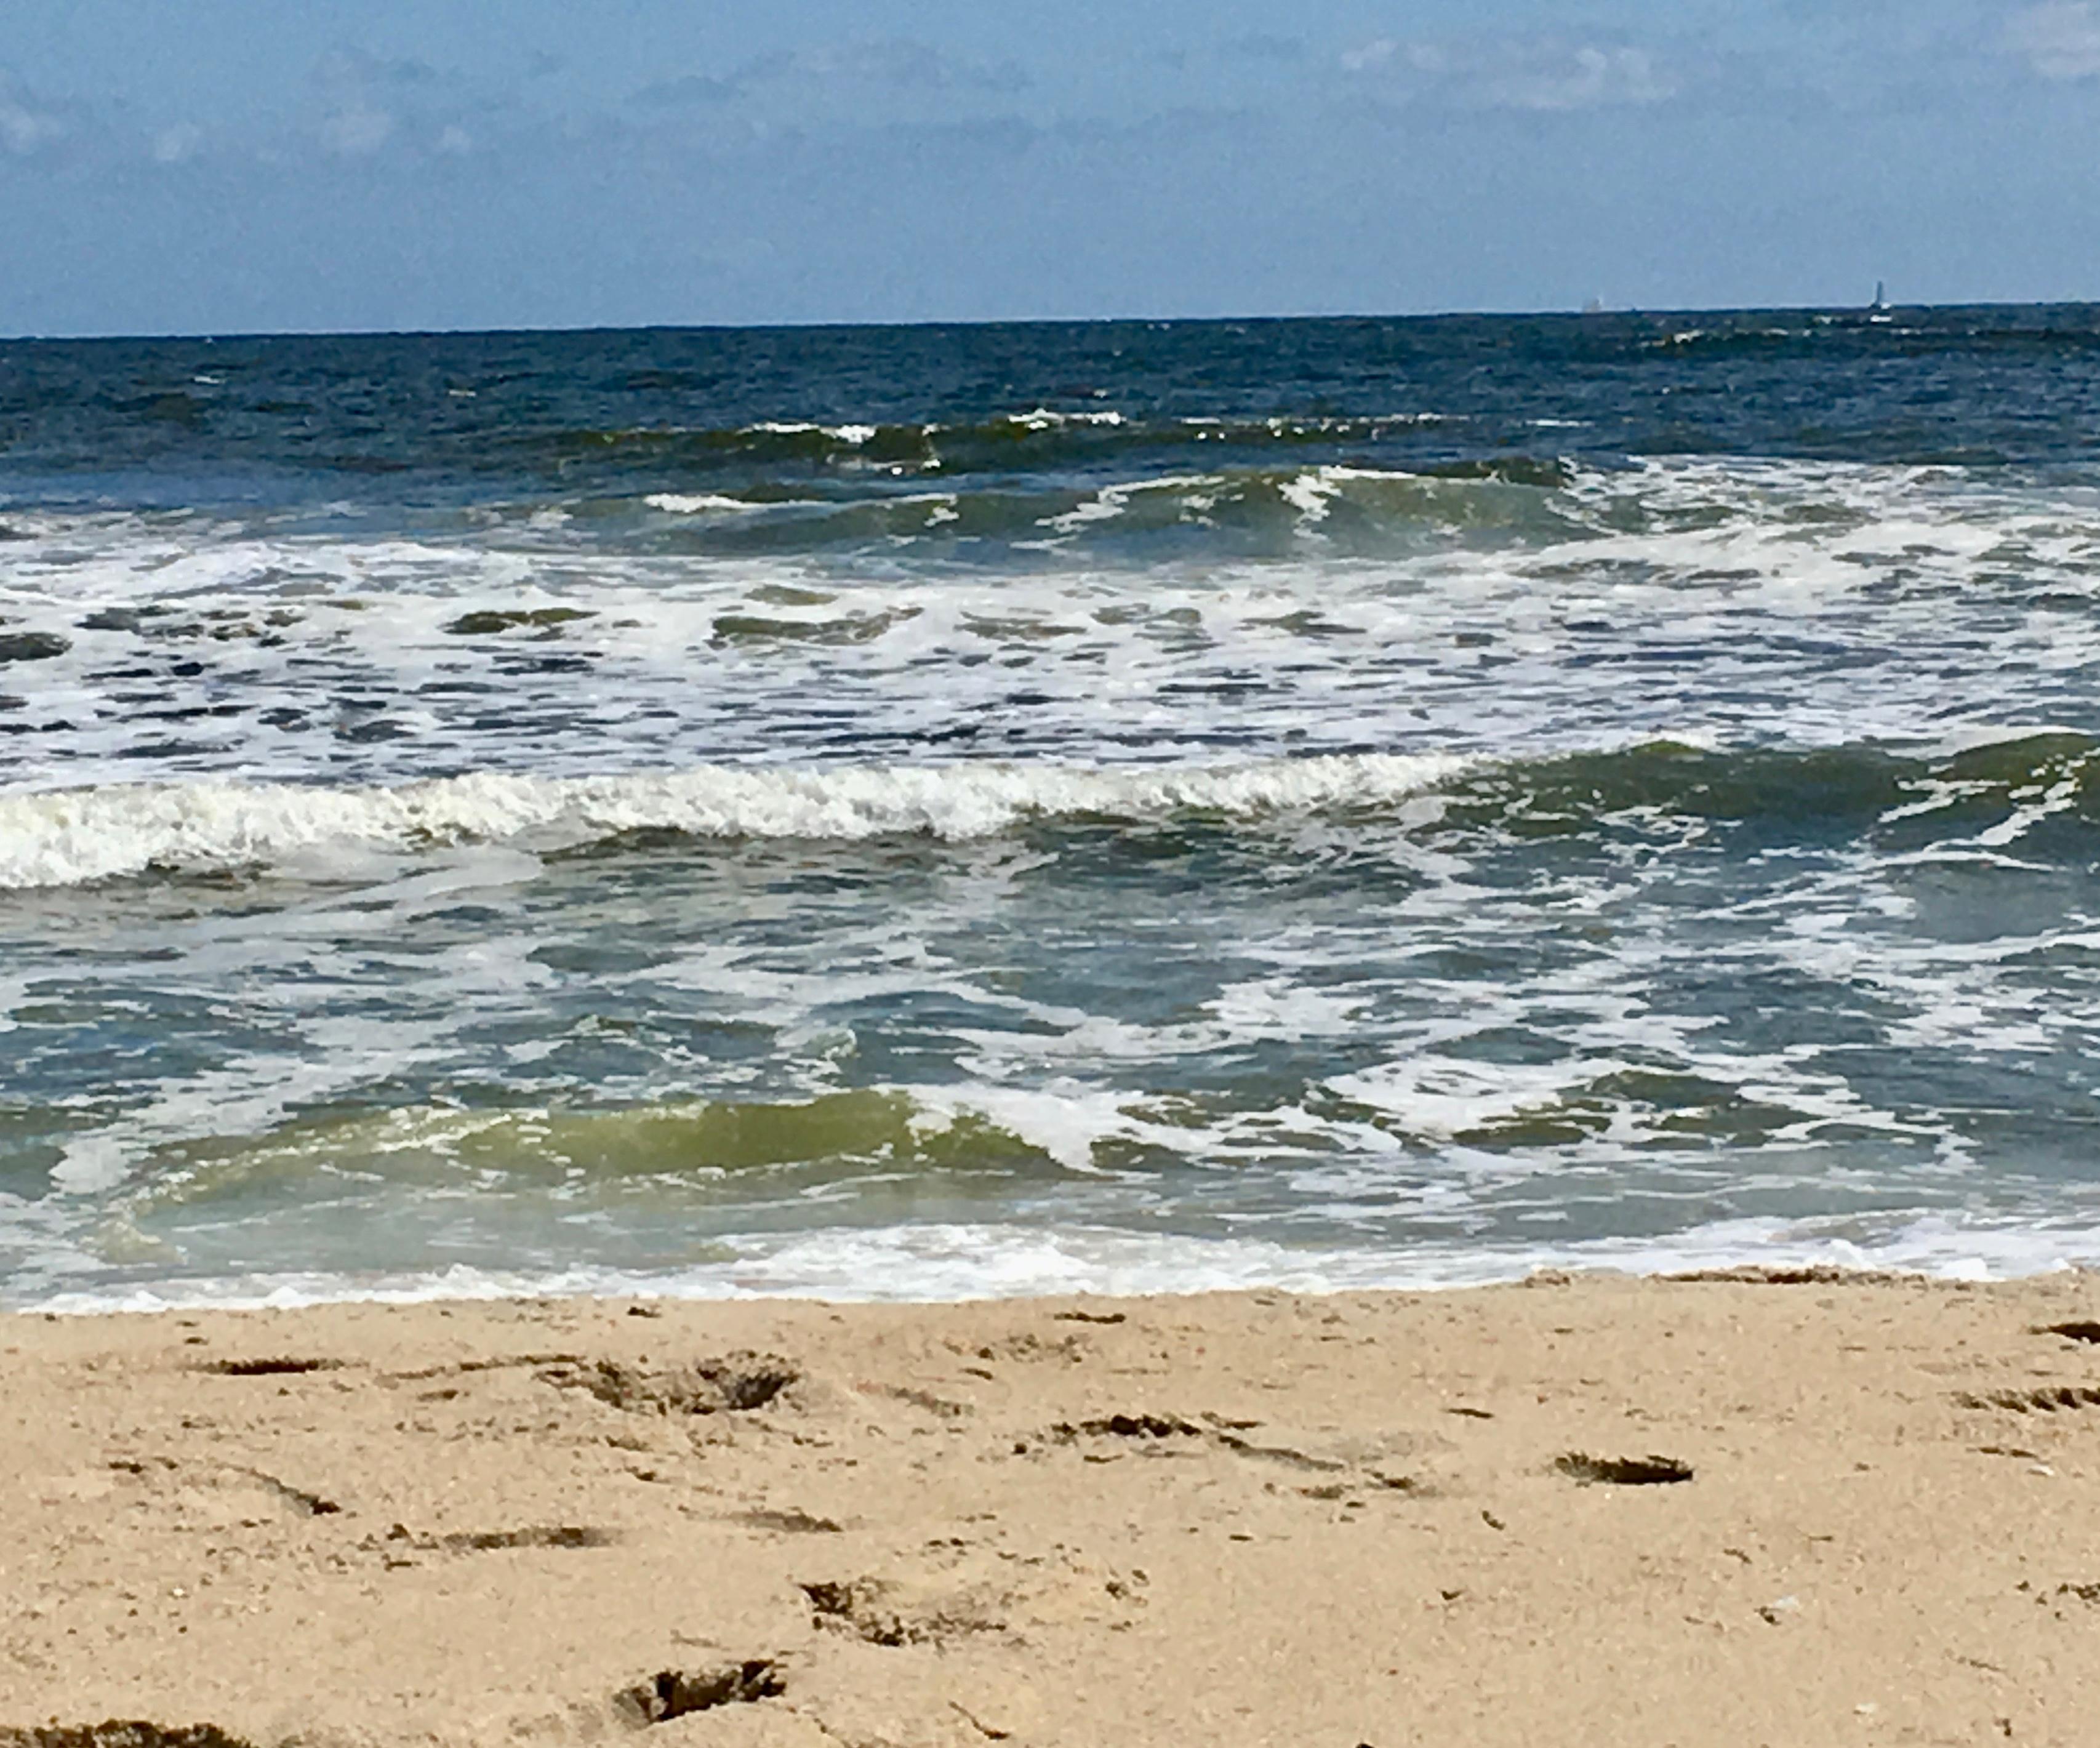 ahh ocean